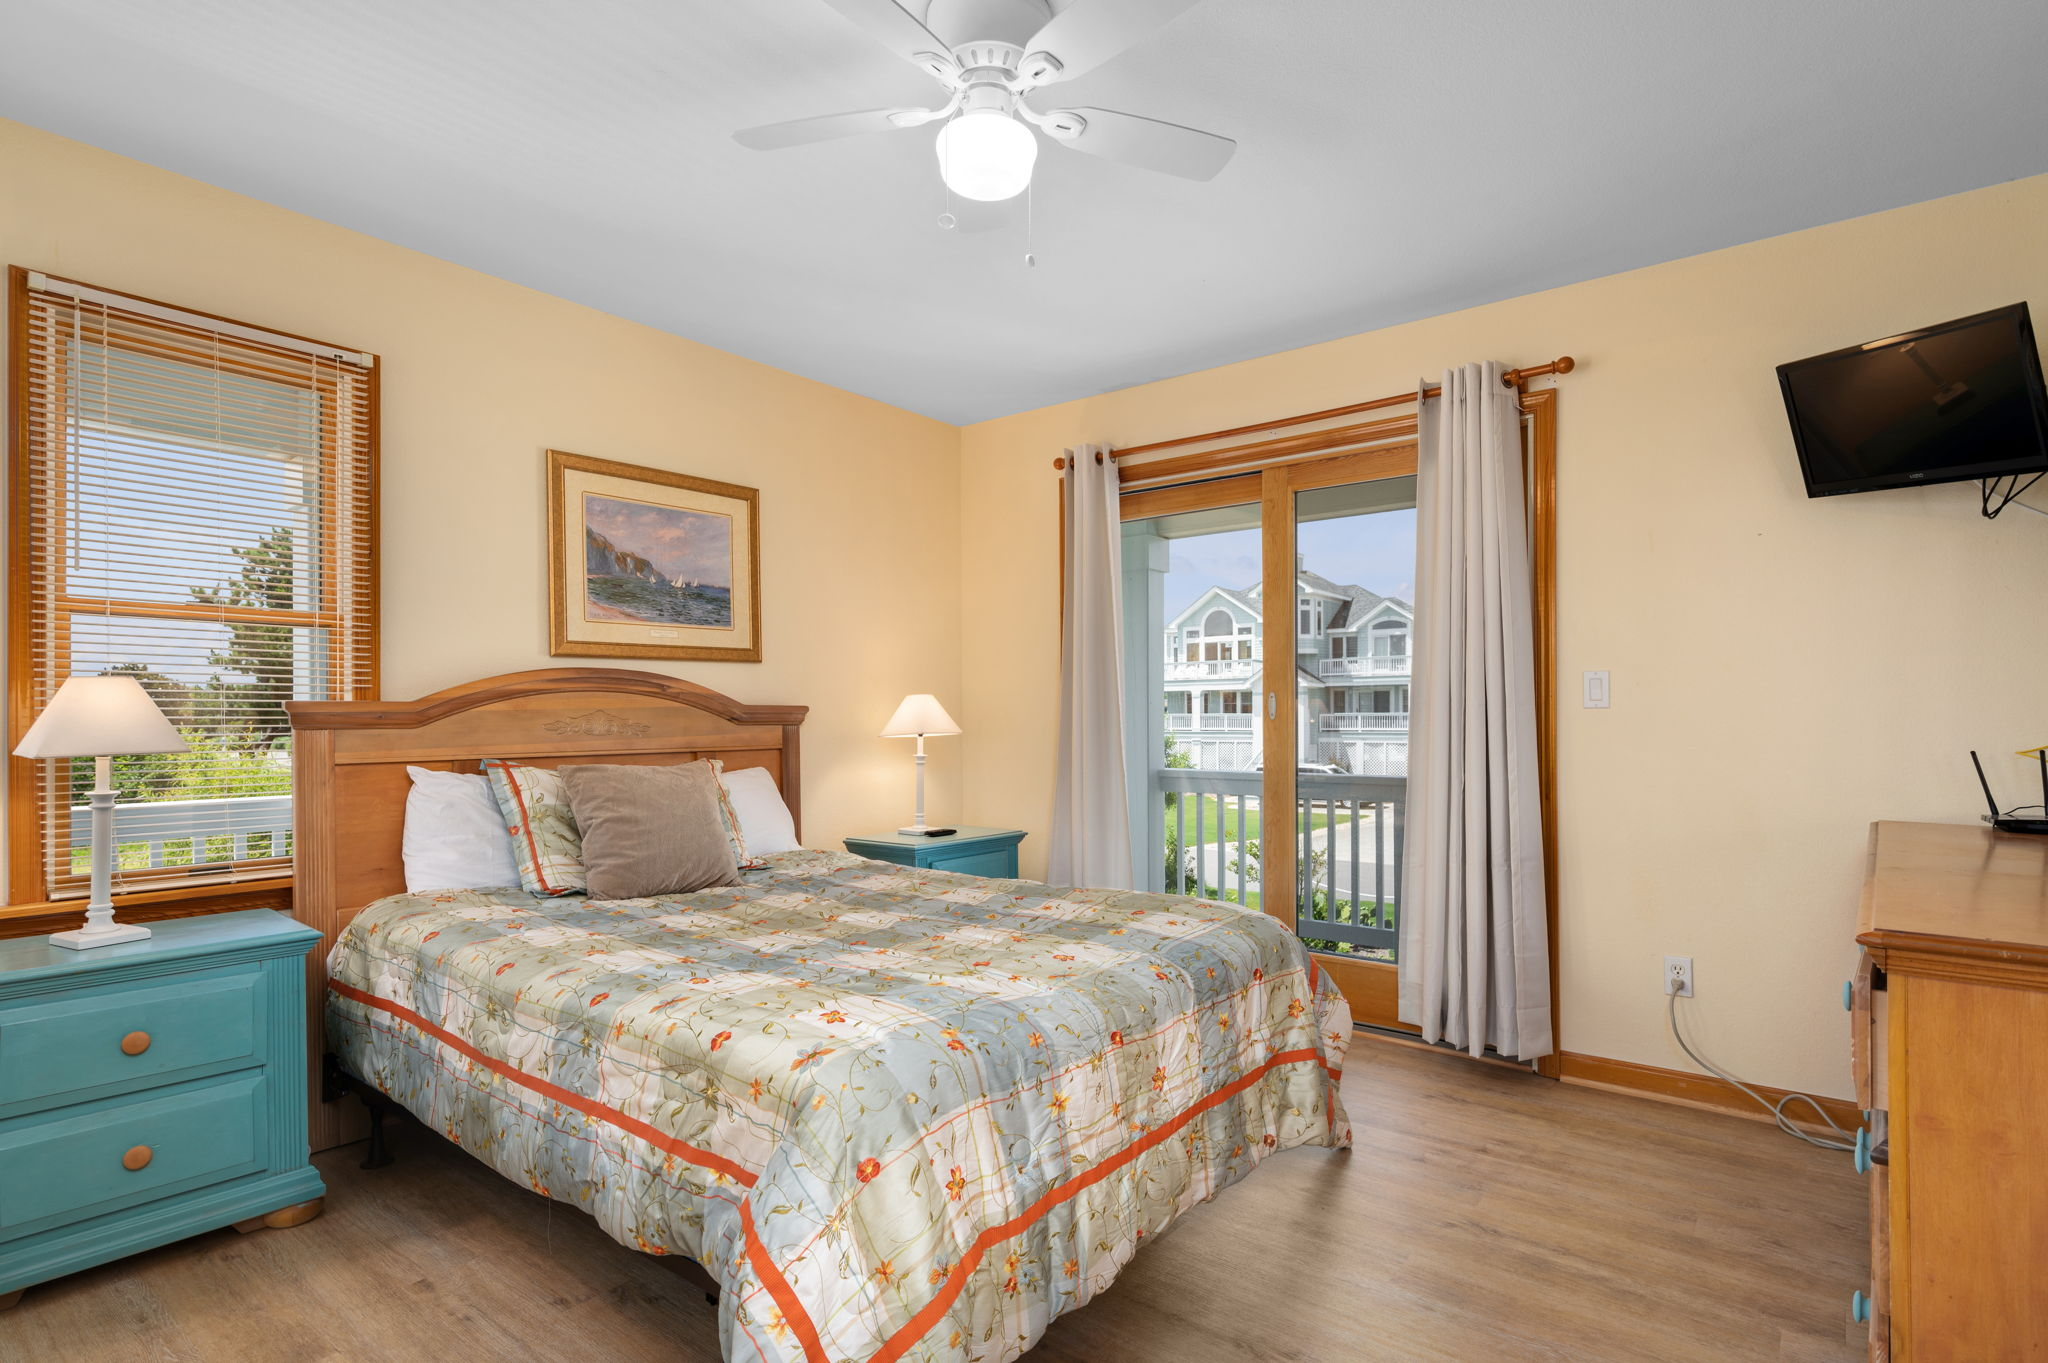 795 Mercury Road   Mid Level Bedroom 5